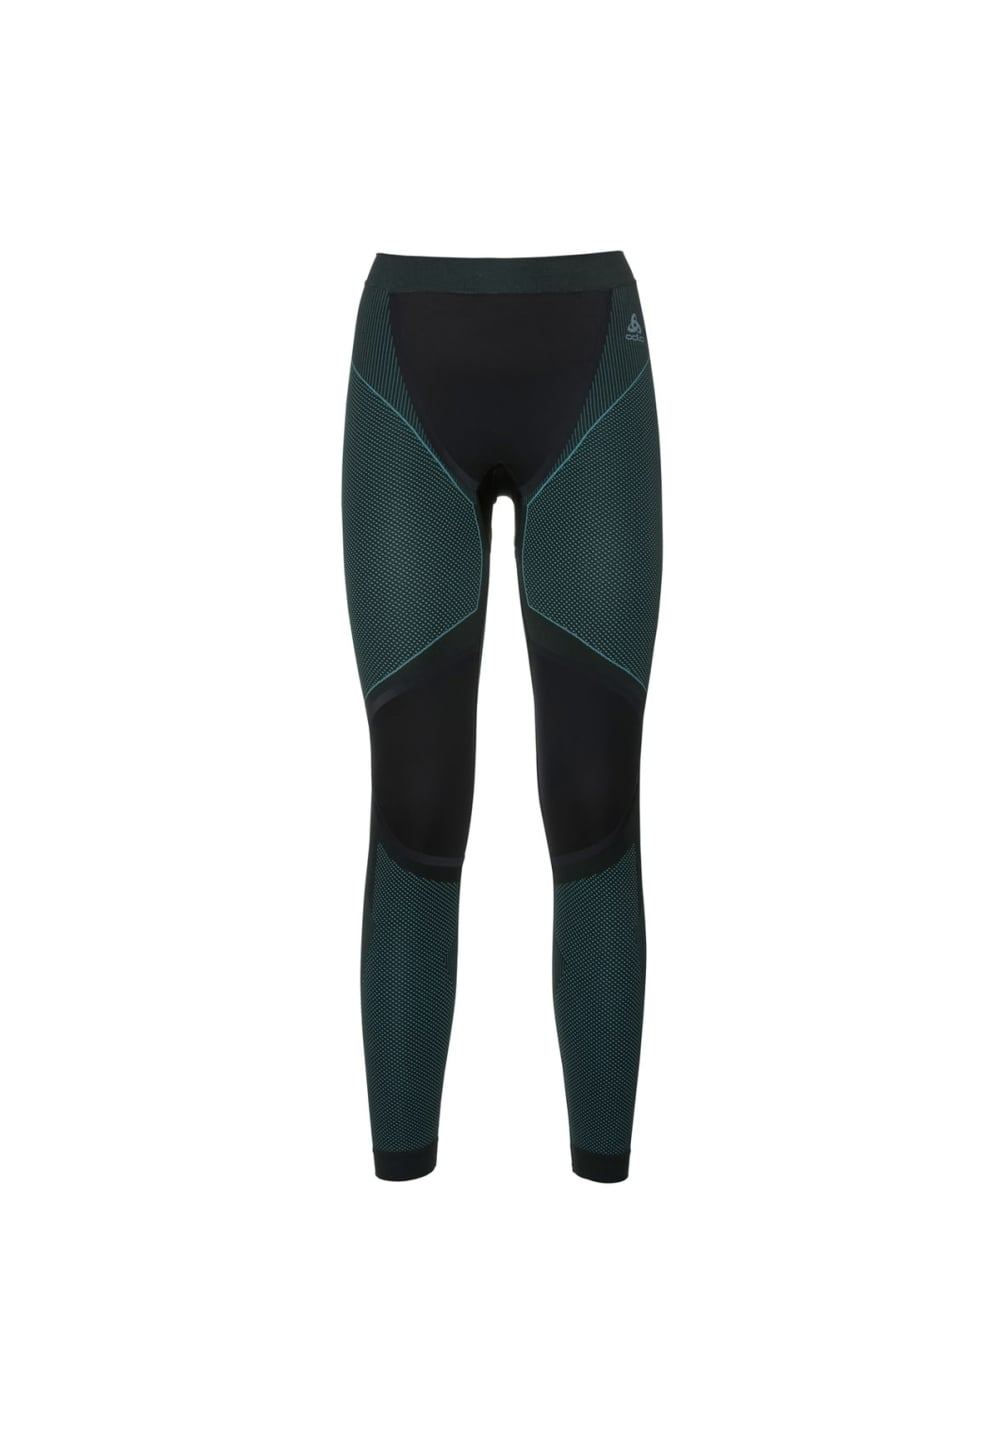 Odlo Bottom Pant Performance Windshield X - Funktionsunterwäsche für Damen - S